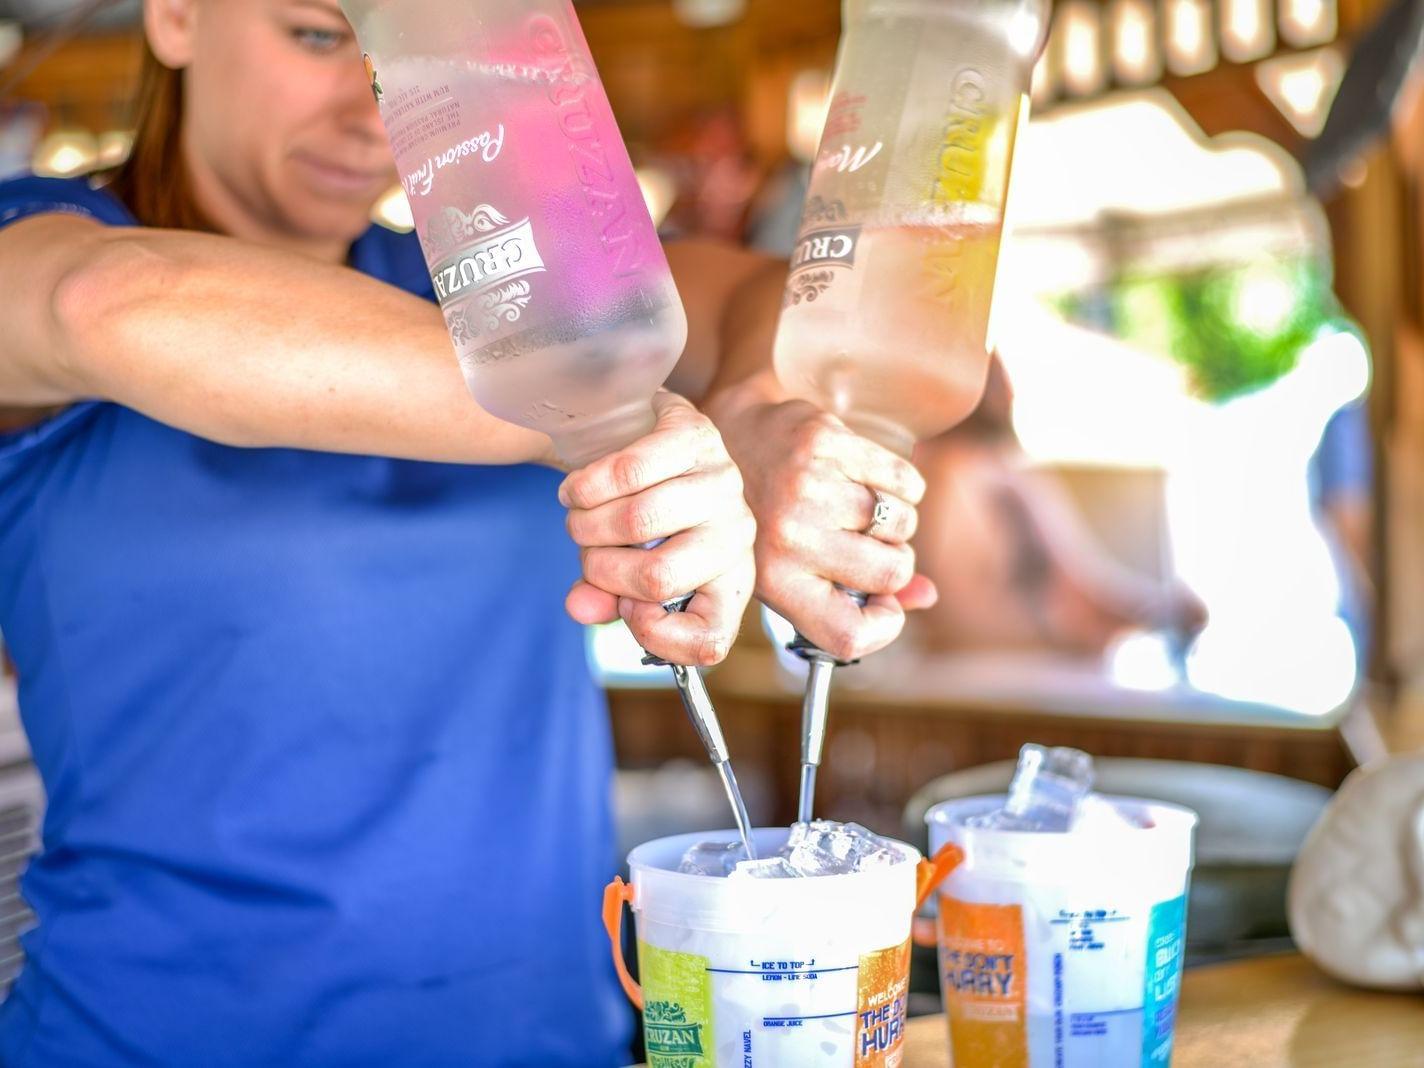 A bartender at Aloha Tiki Bar & Grill in Mystic Dunes Resort